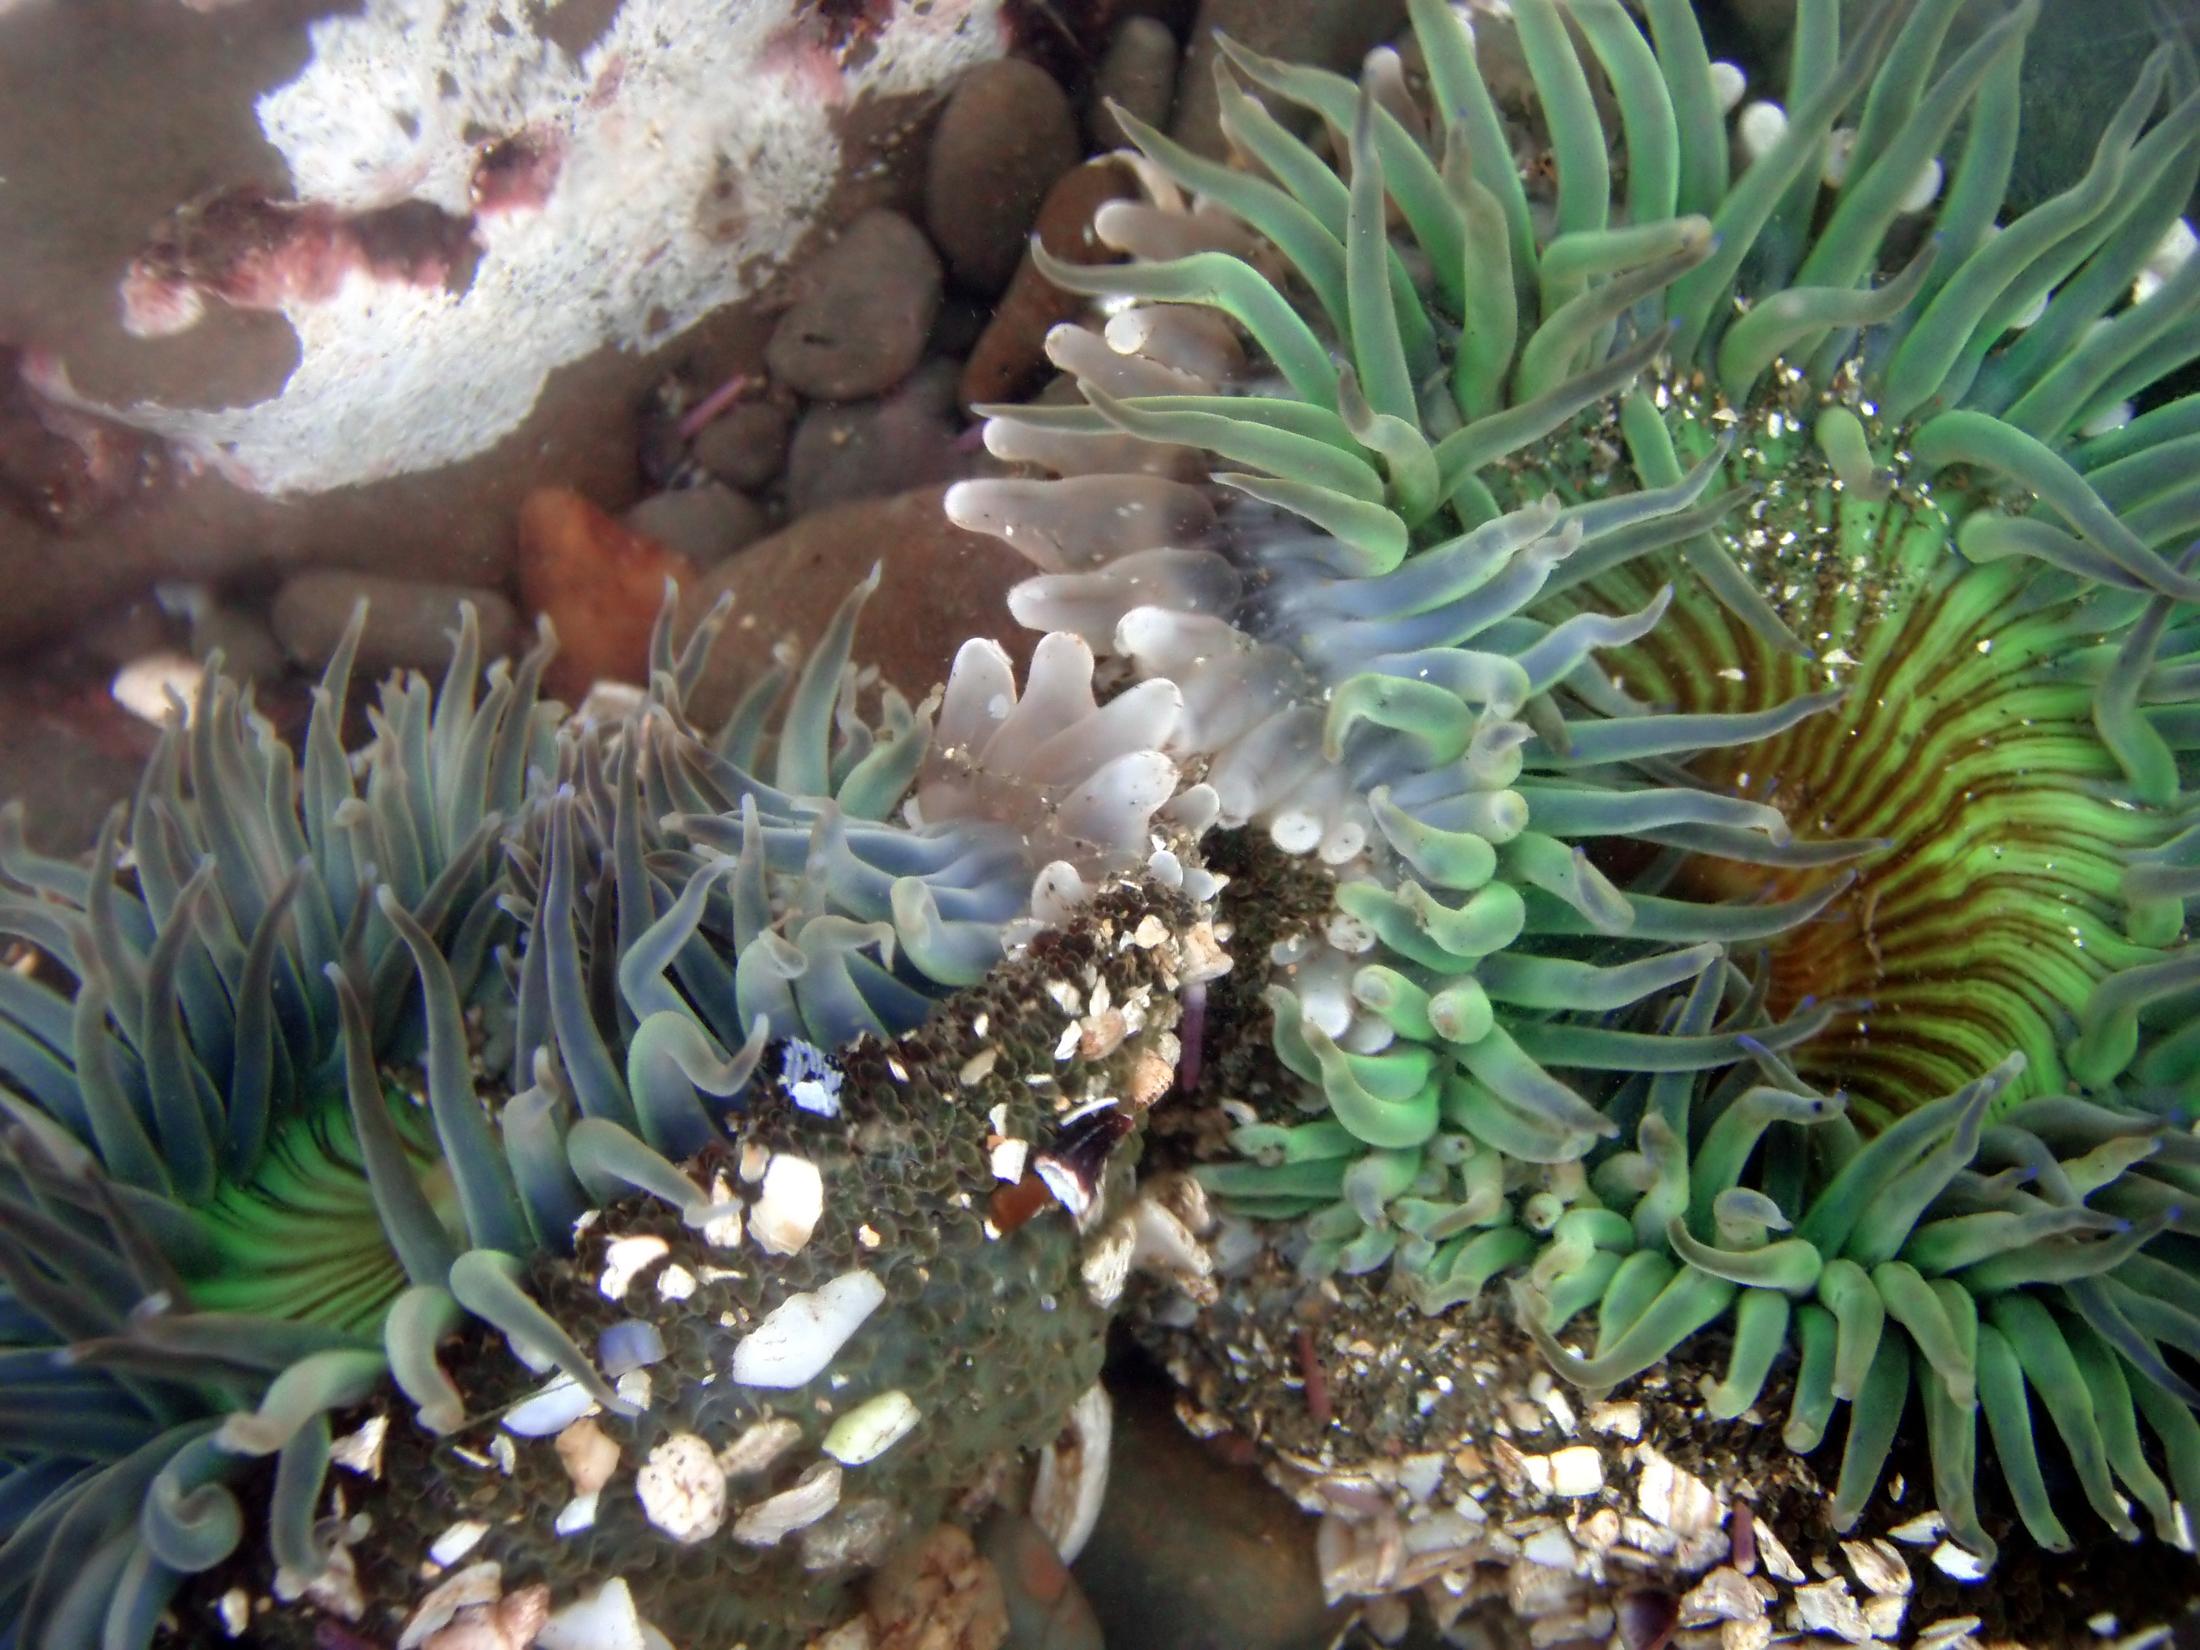 File Clone War Of Sea Anemones 2 17 08 2 Jpg Wikimedia